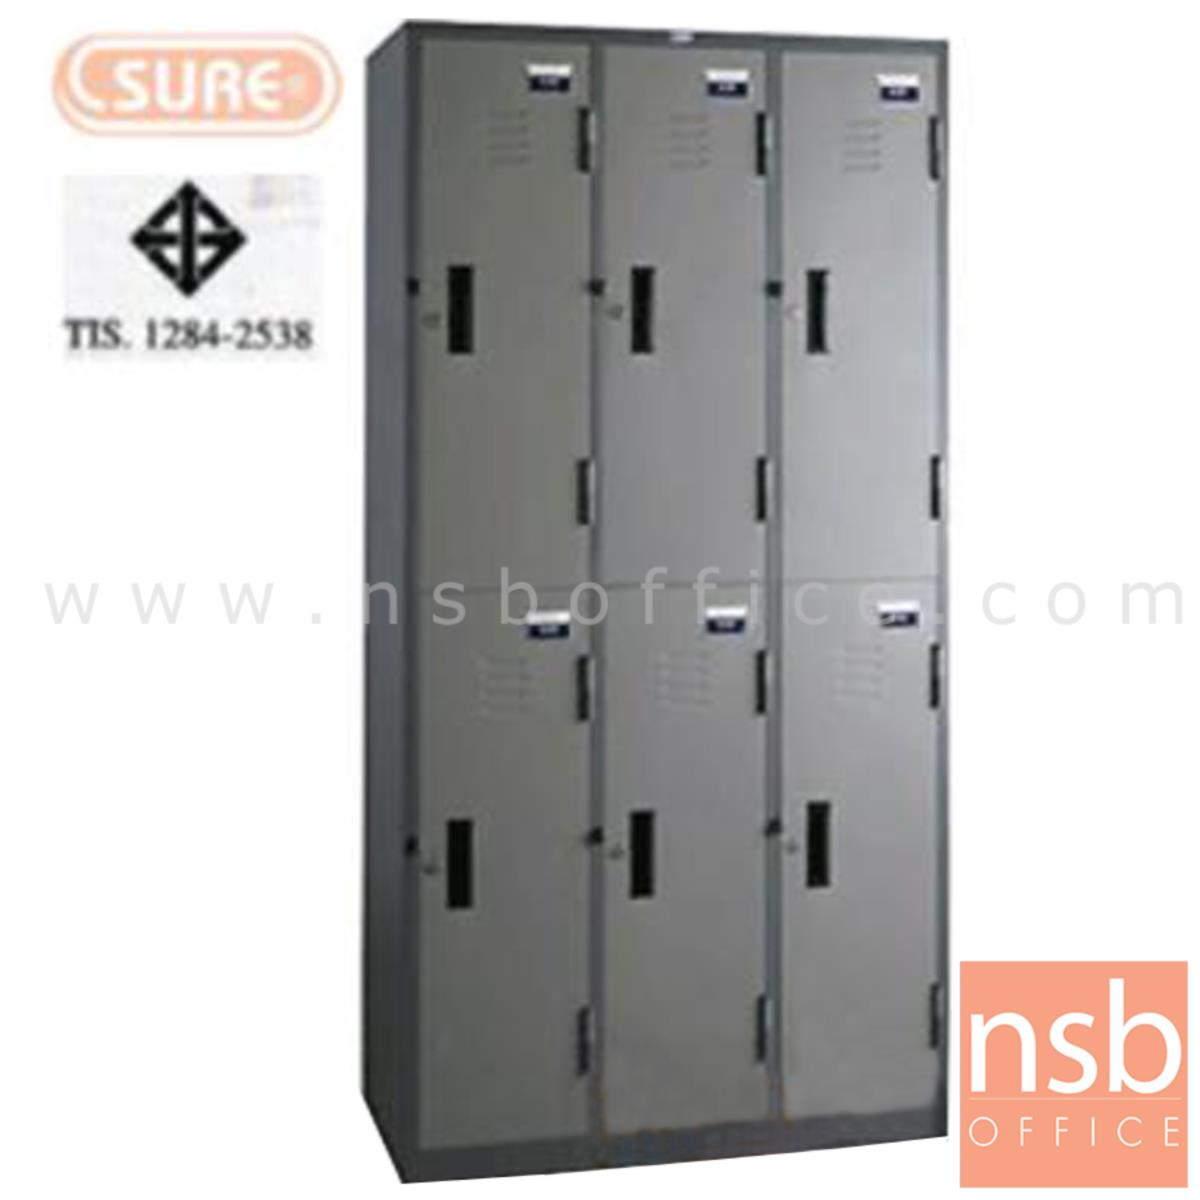 E04A020:ตู้ล็อกเกอร์ 6 ประตู มี มอก. รุ่น LK-006